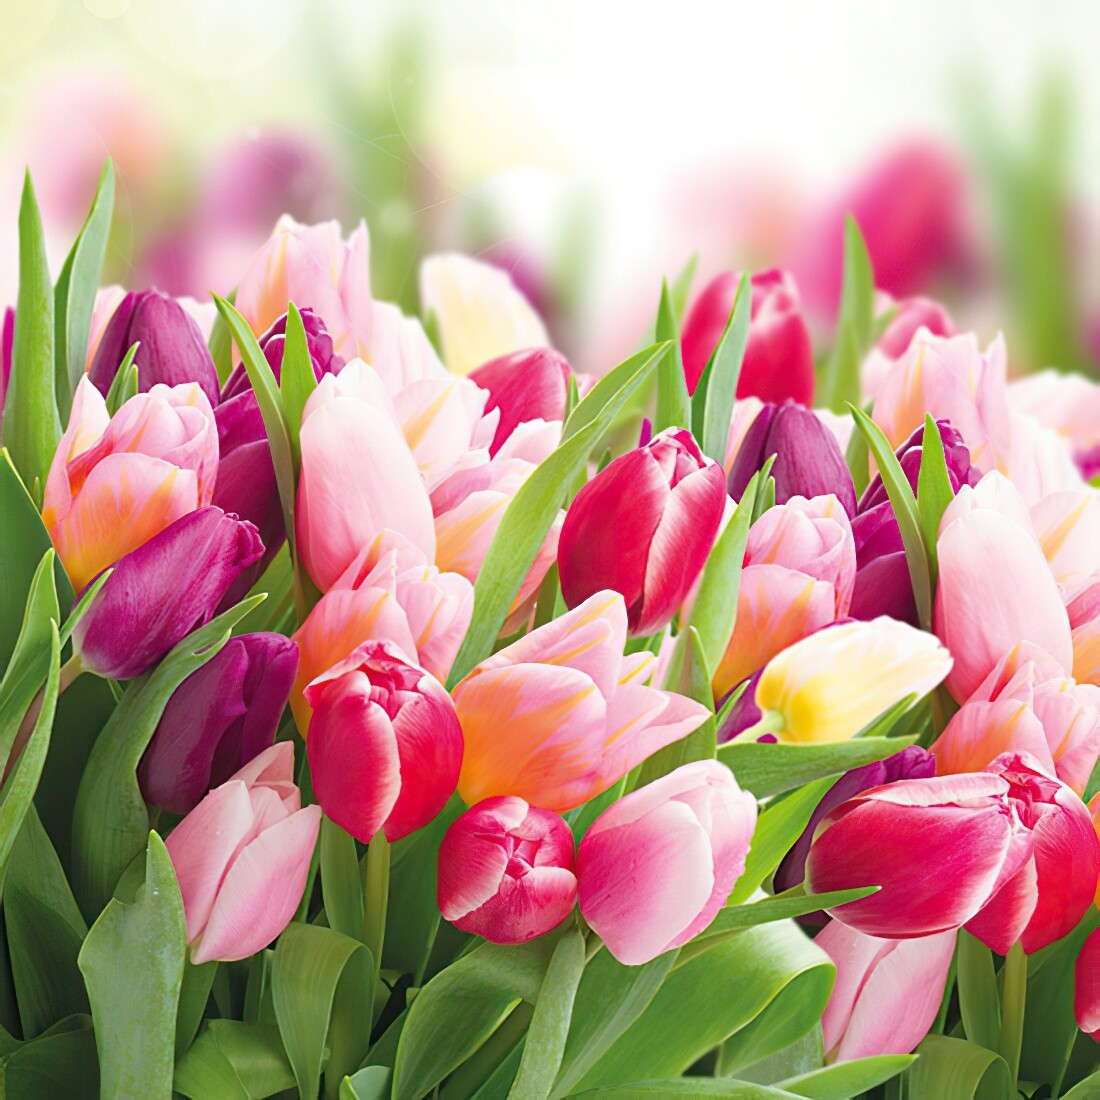 Decoupage Paper Napkins - Floral - Glorious Tulips (1 Sheet)